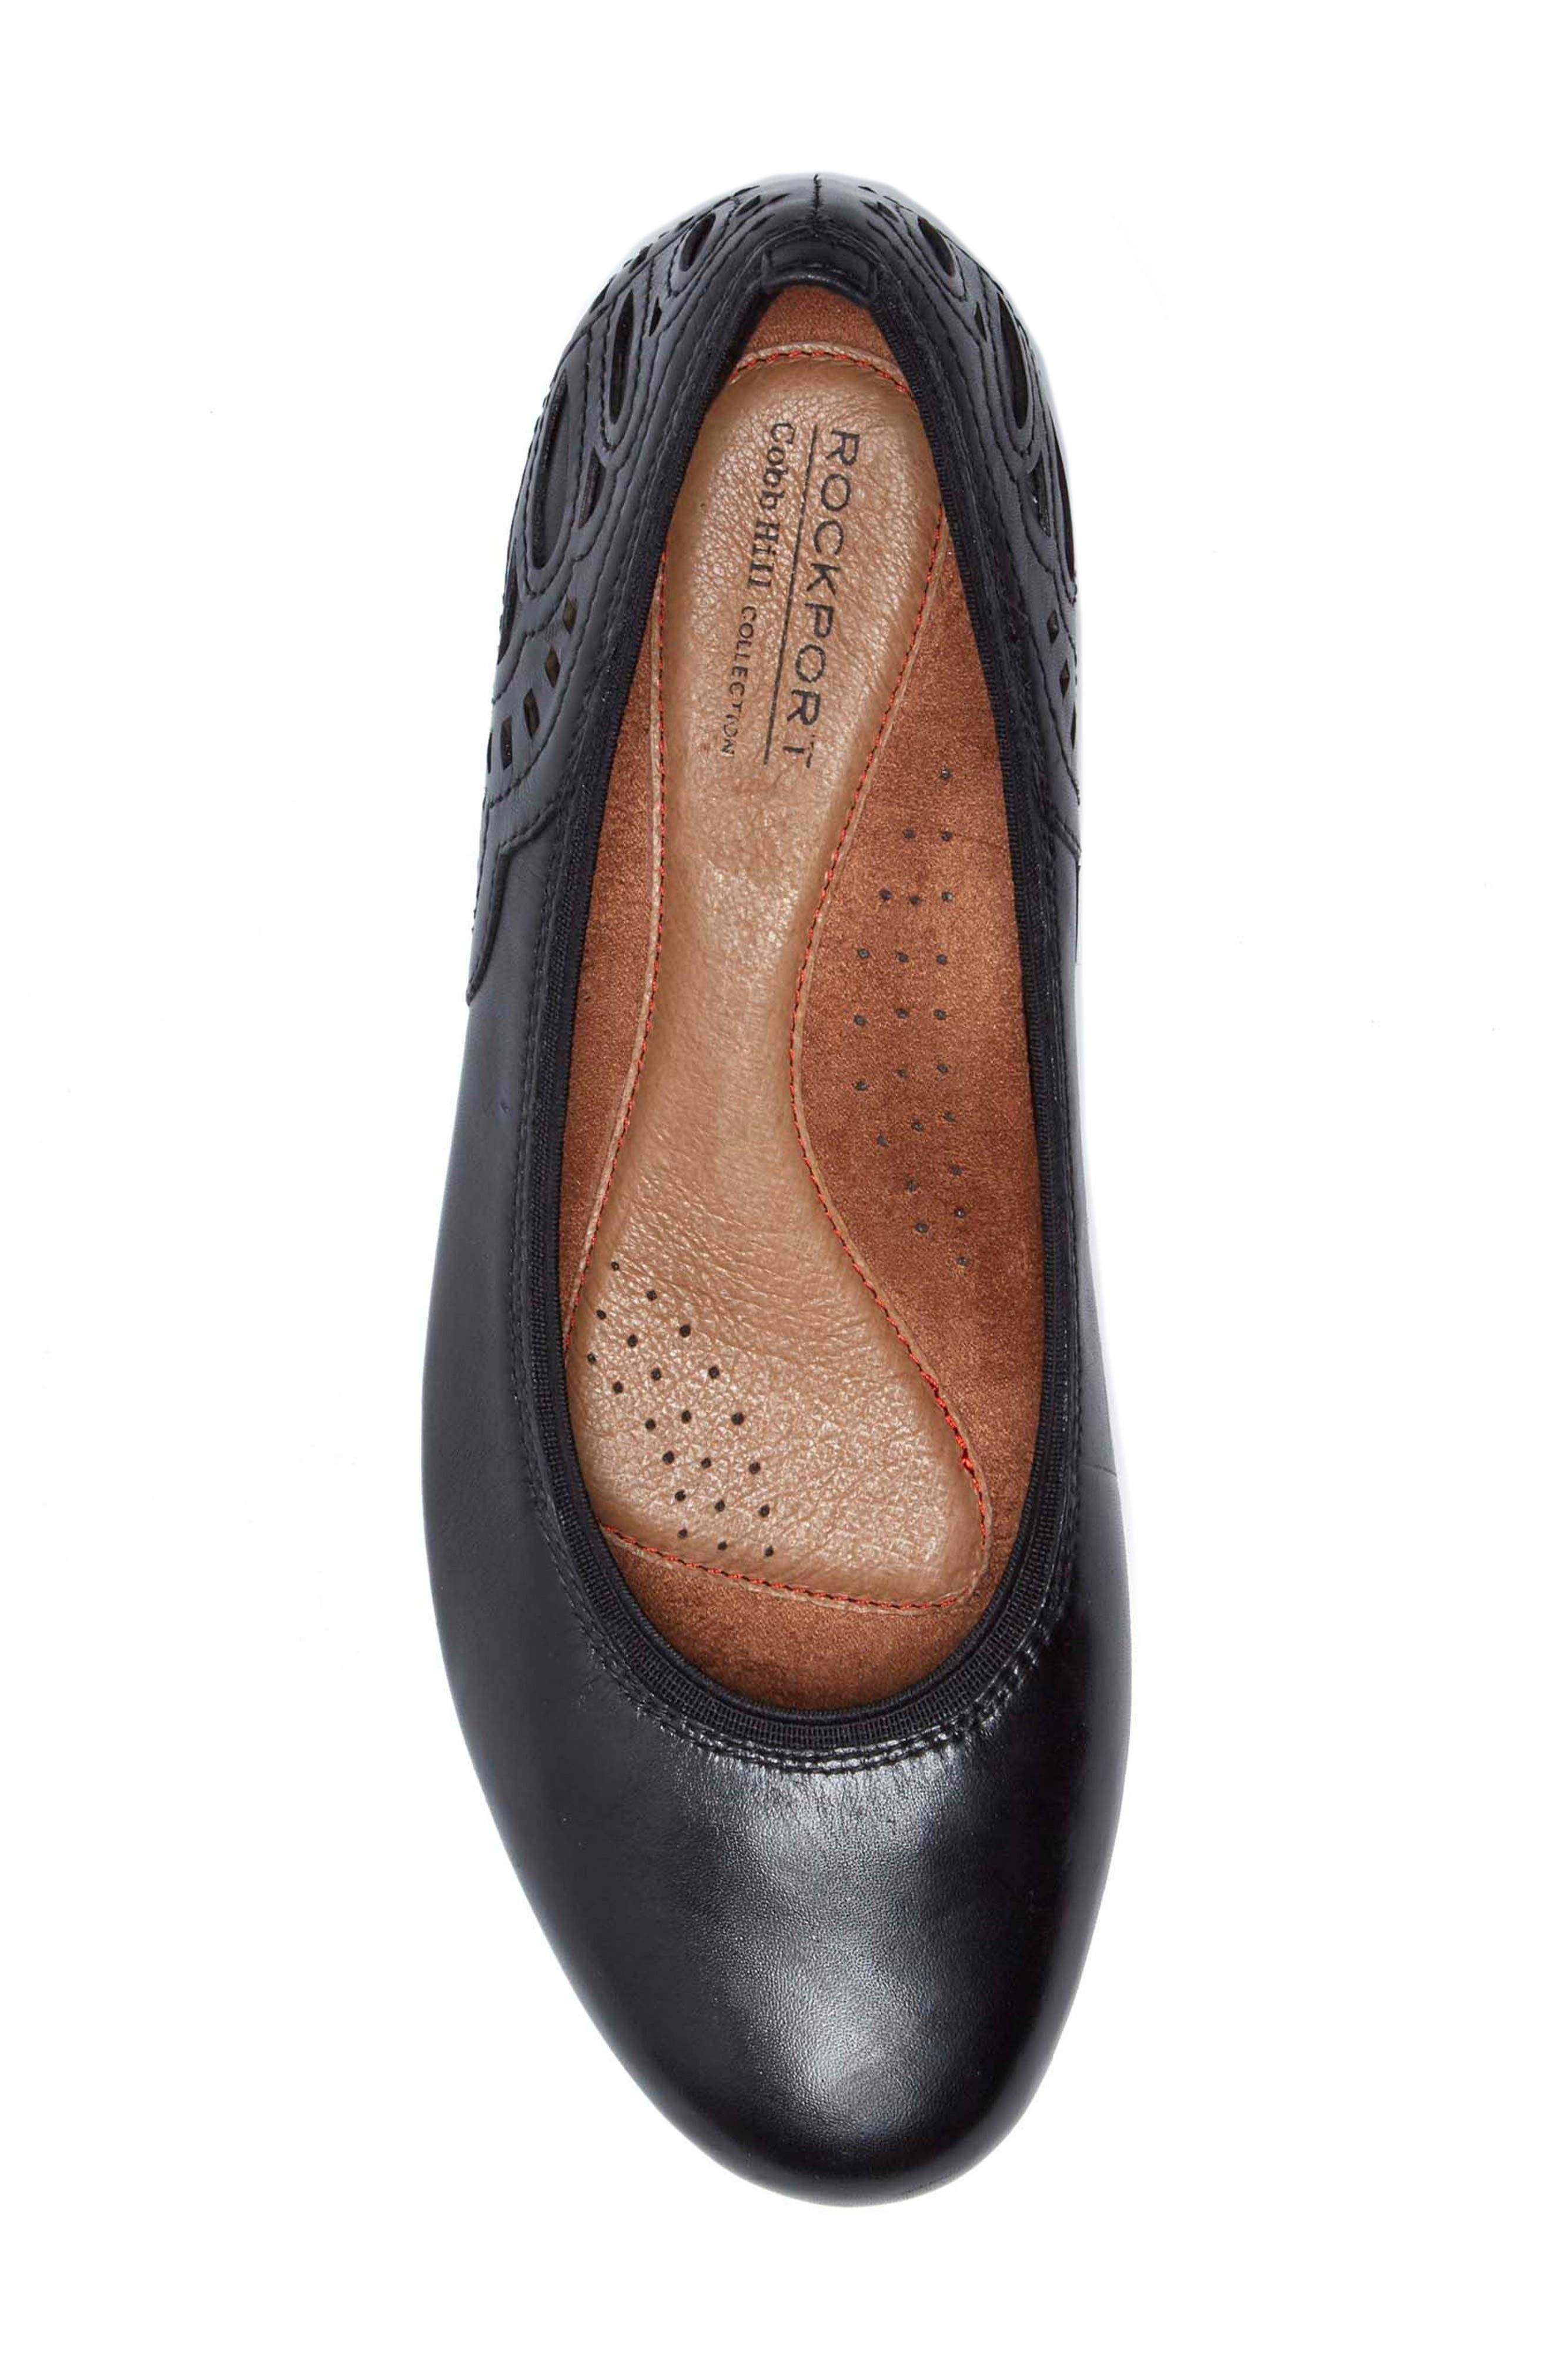 Sharleen Wedge Pump,                             Alternate thumbnail 5, color,                             Black Leather